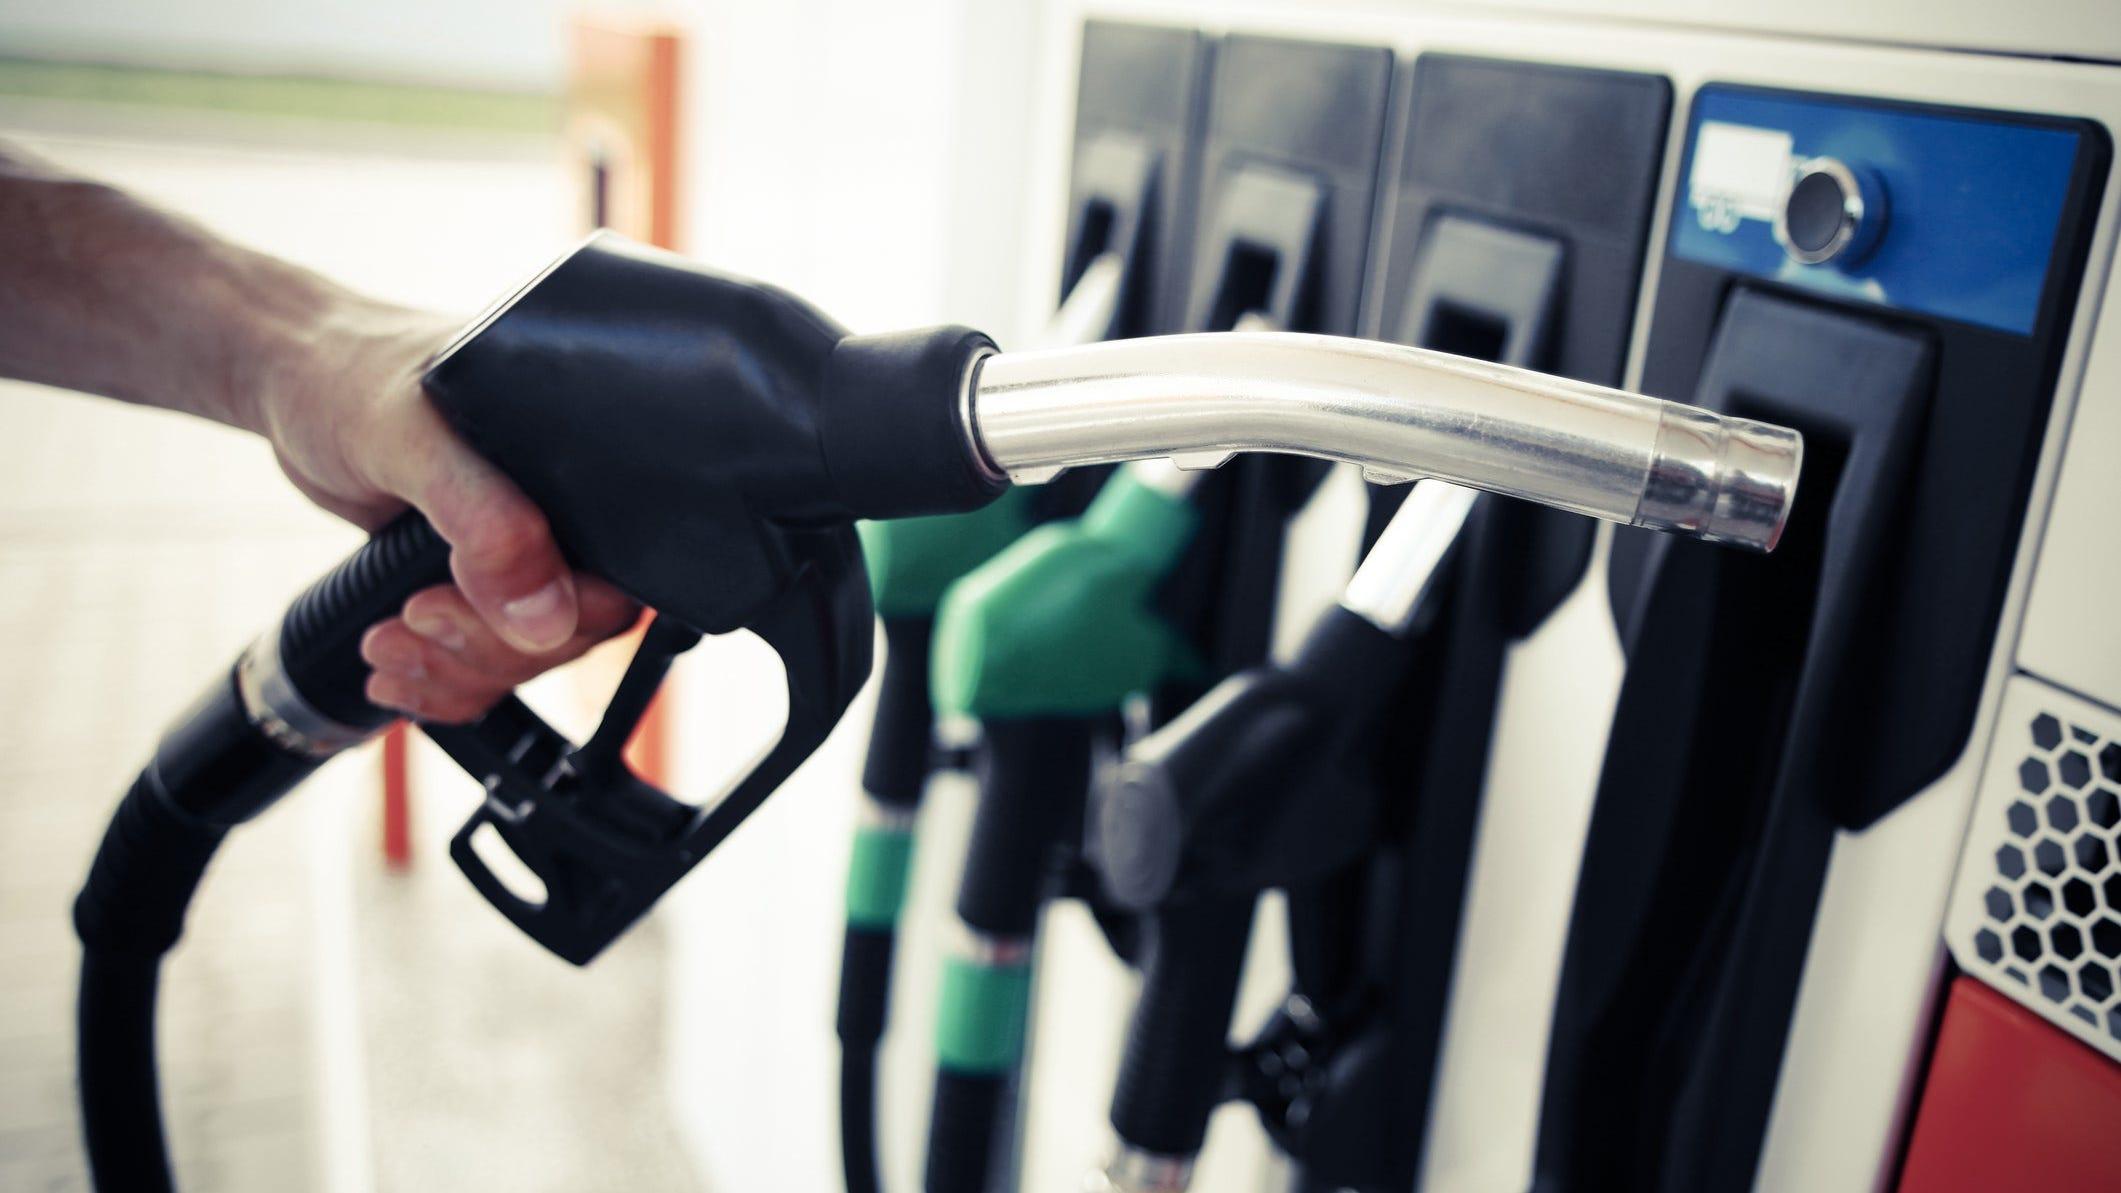 Florida Gasoline Prices Could Dip Below